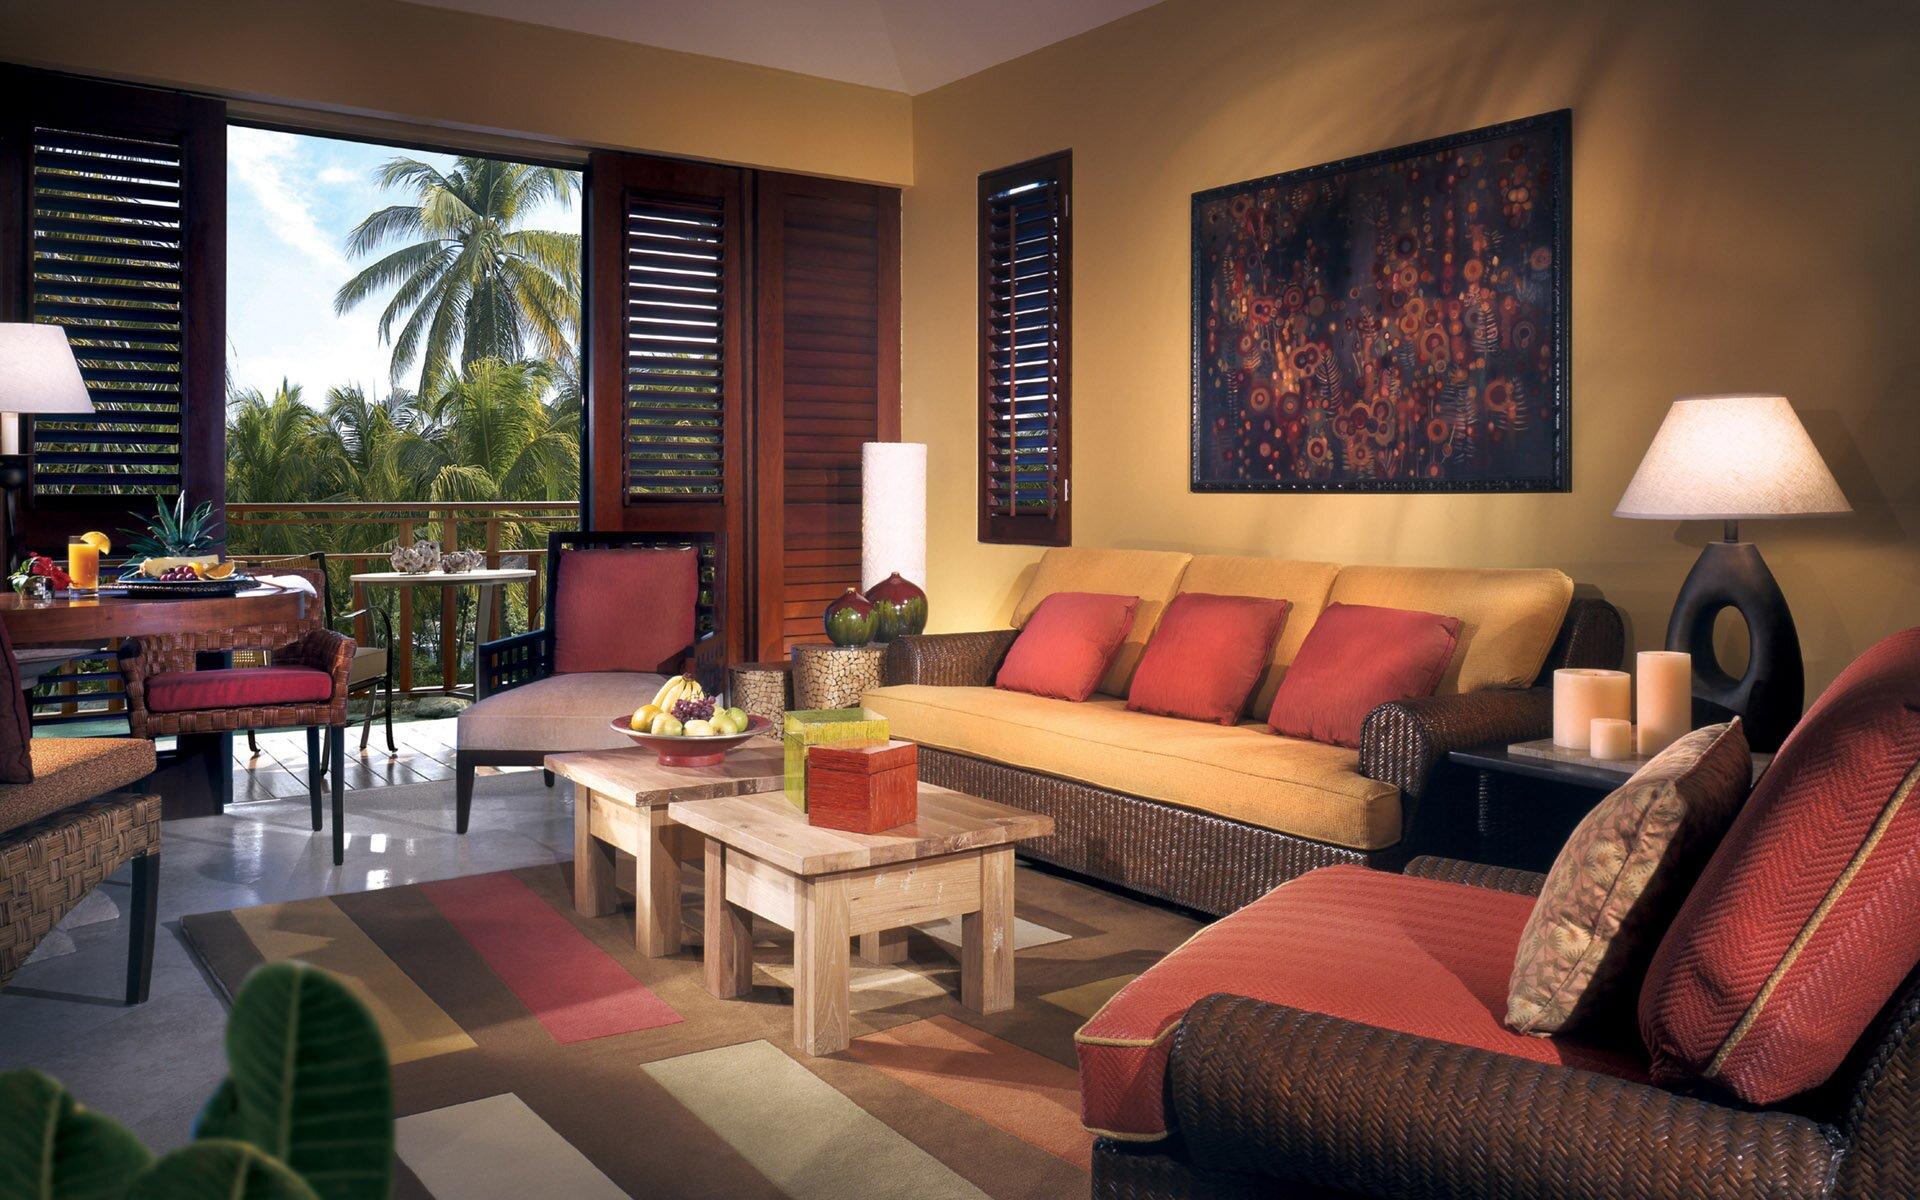 Tropical Living Room Decorating 21 Samples Of Decorative Living Room Furniture Sets